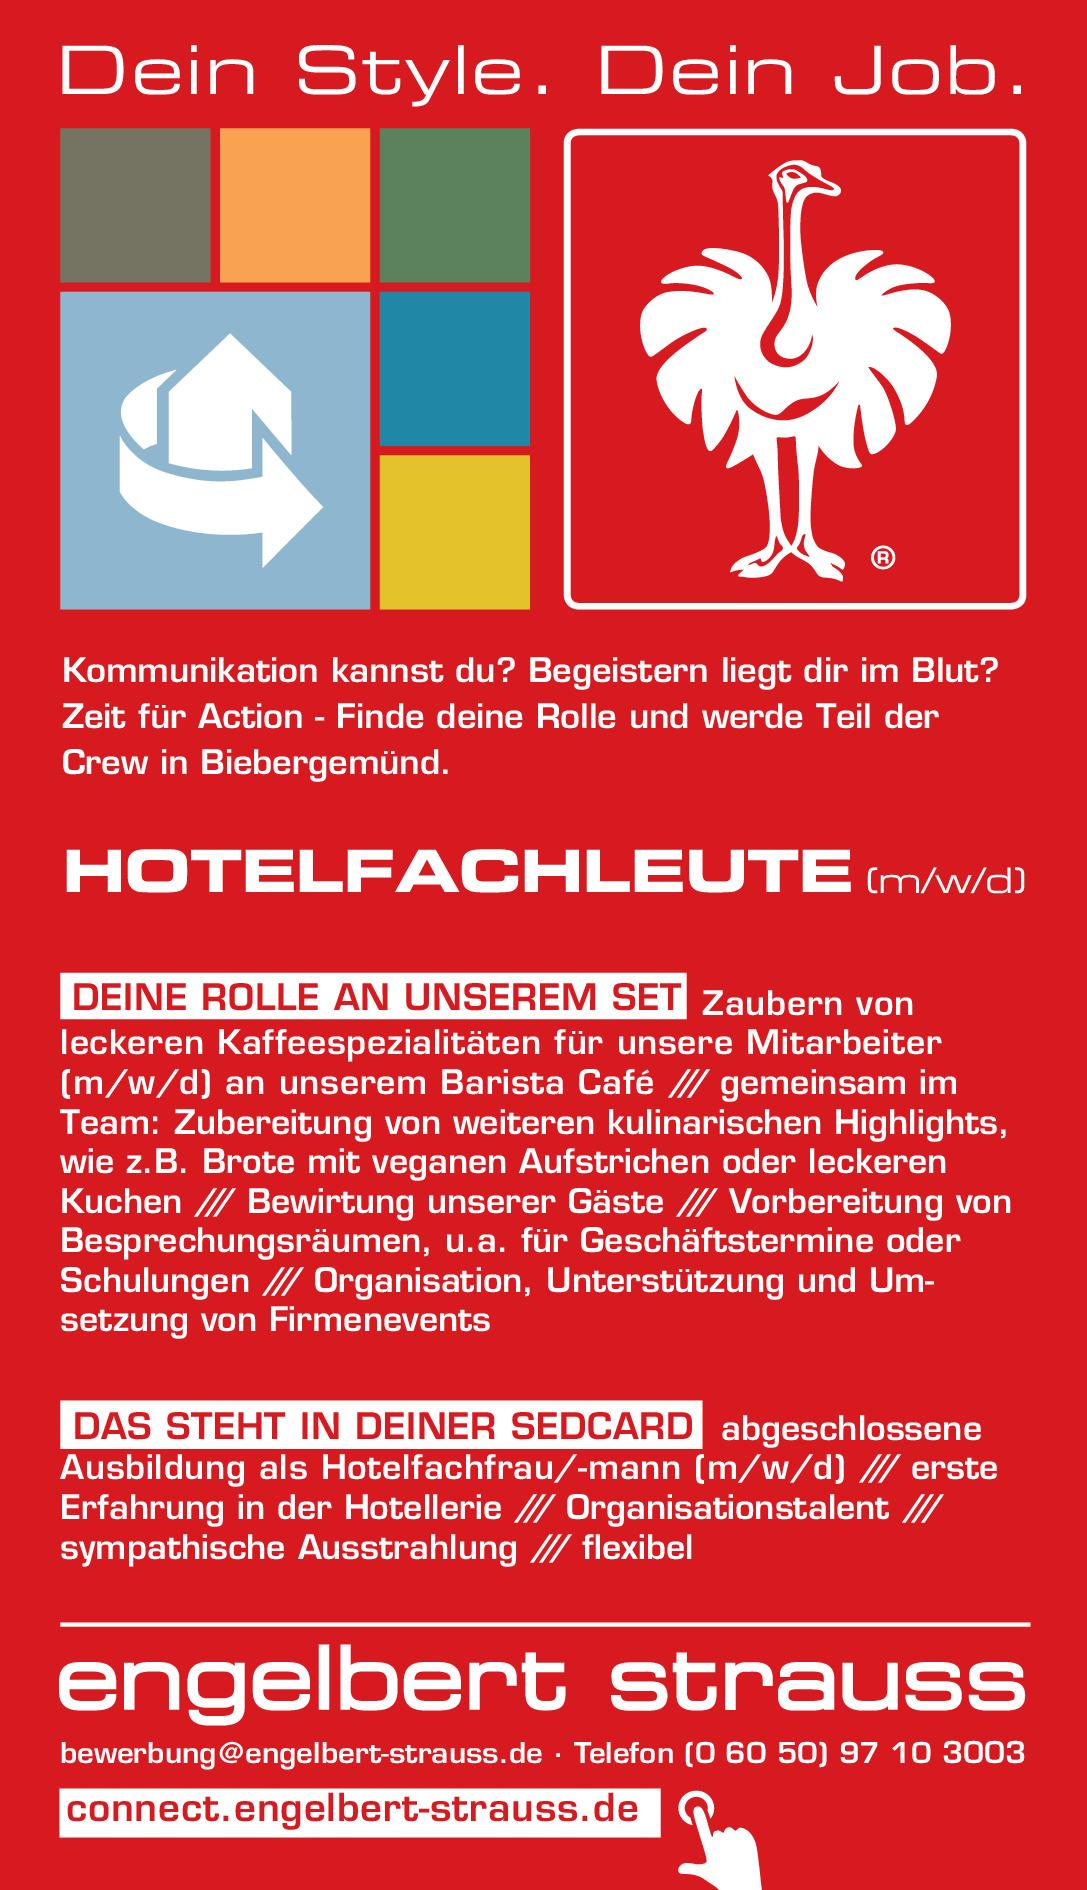 Hotelfachleute (m/w/d)